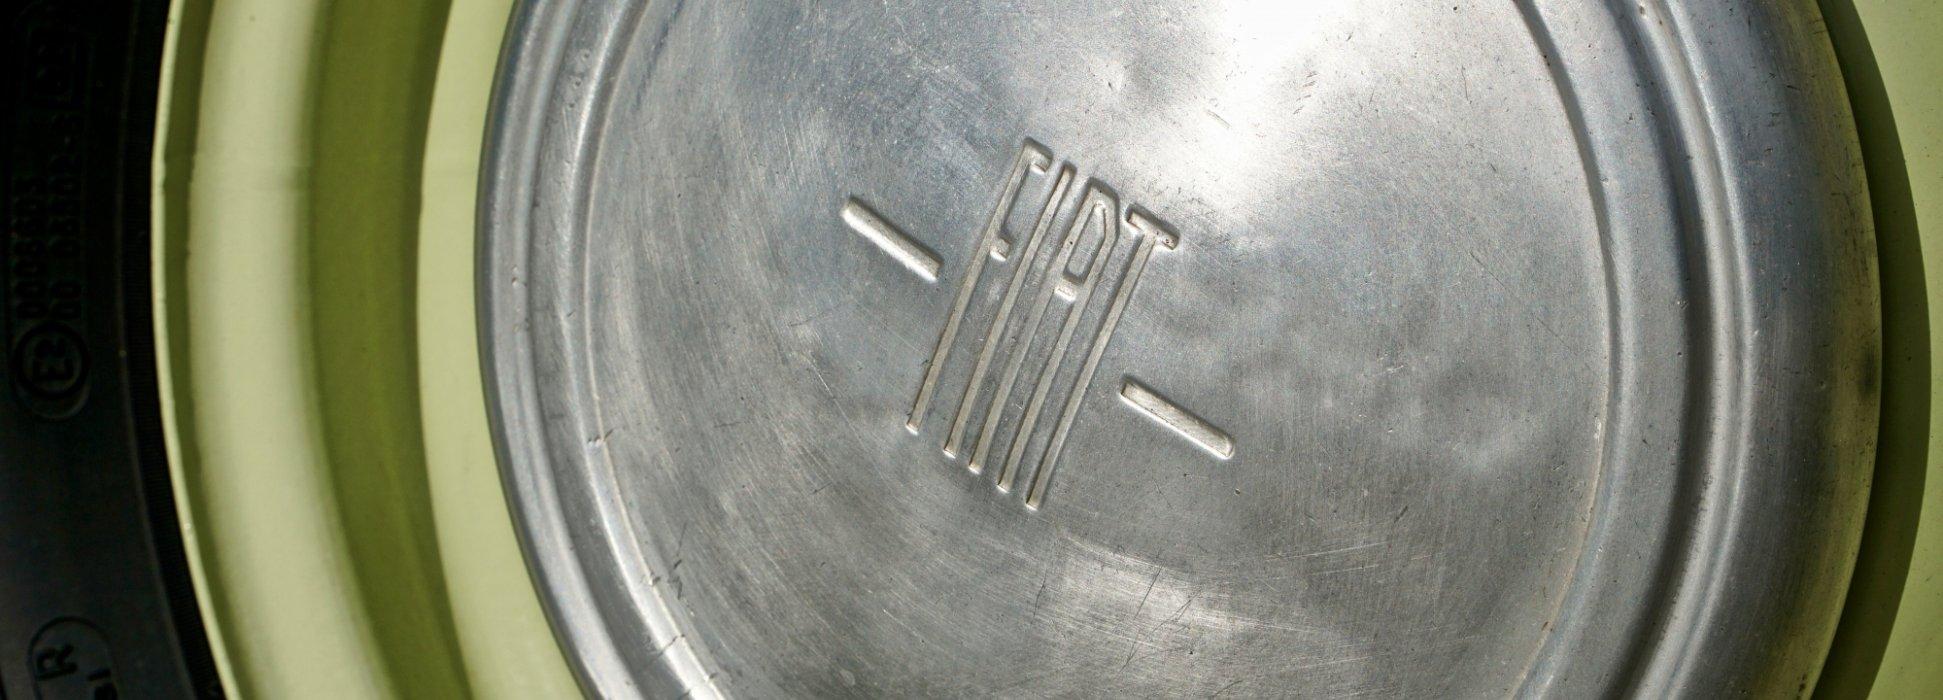 Fiat 1100 Industriale 1